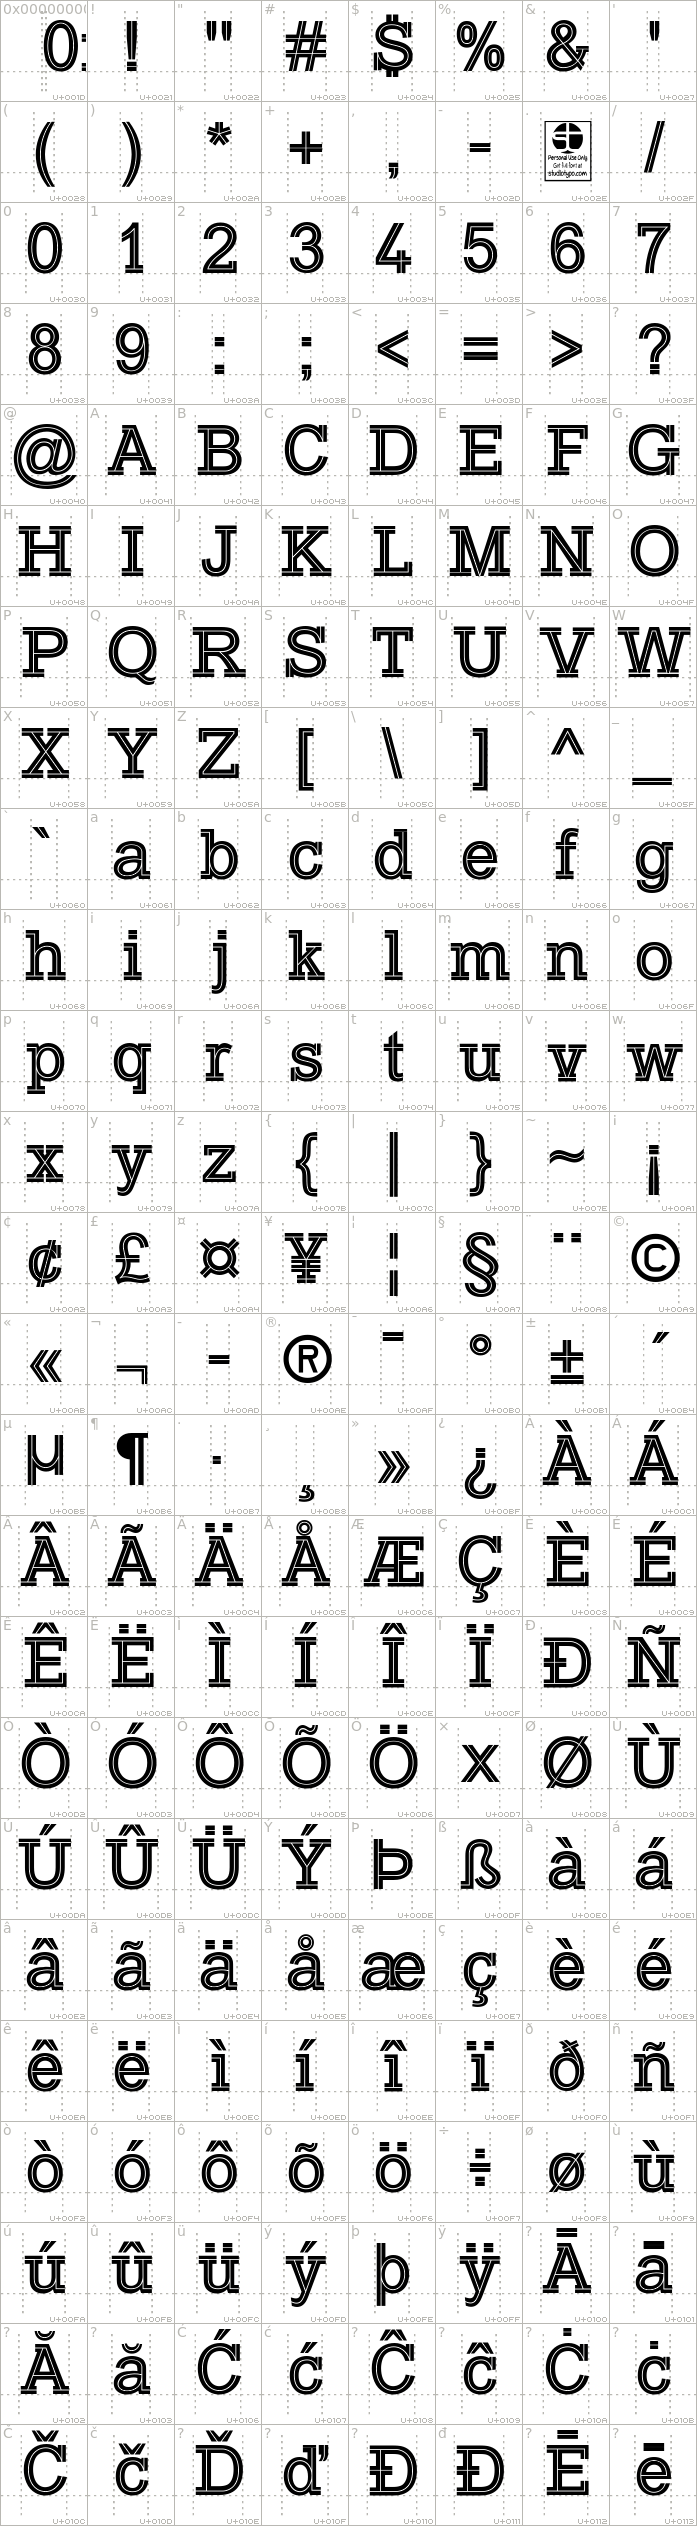 typo-slab-inline-demo.regular.character-map-1